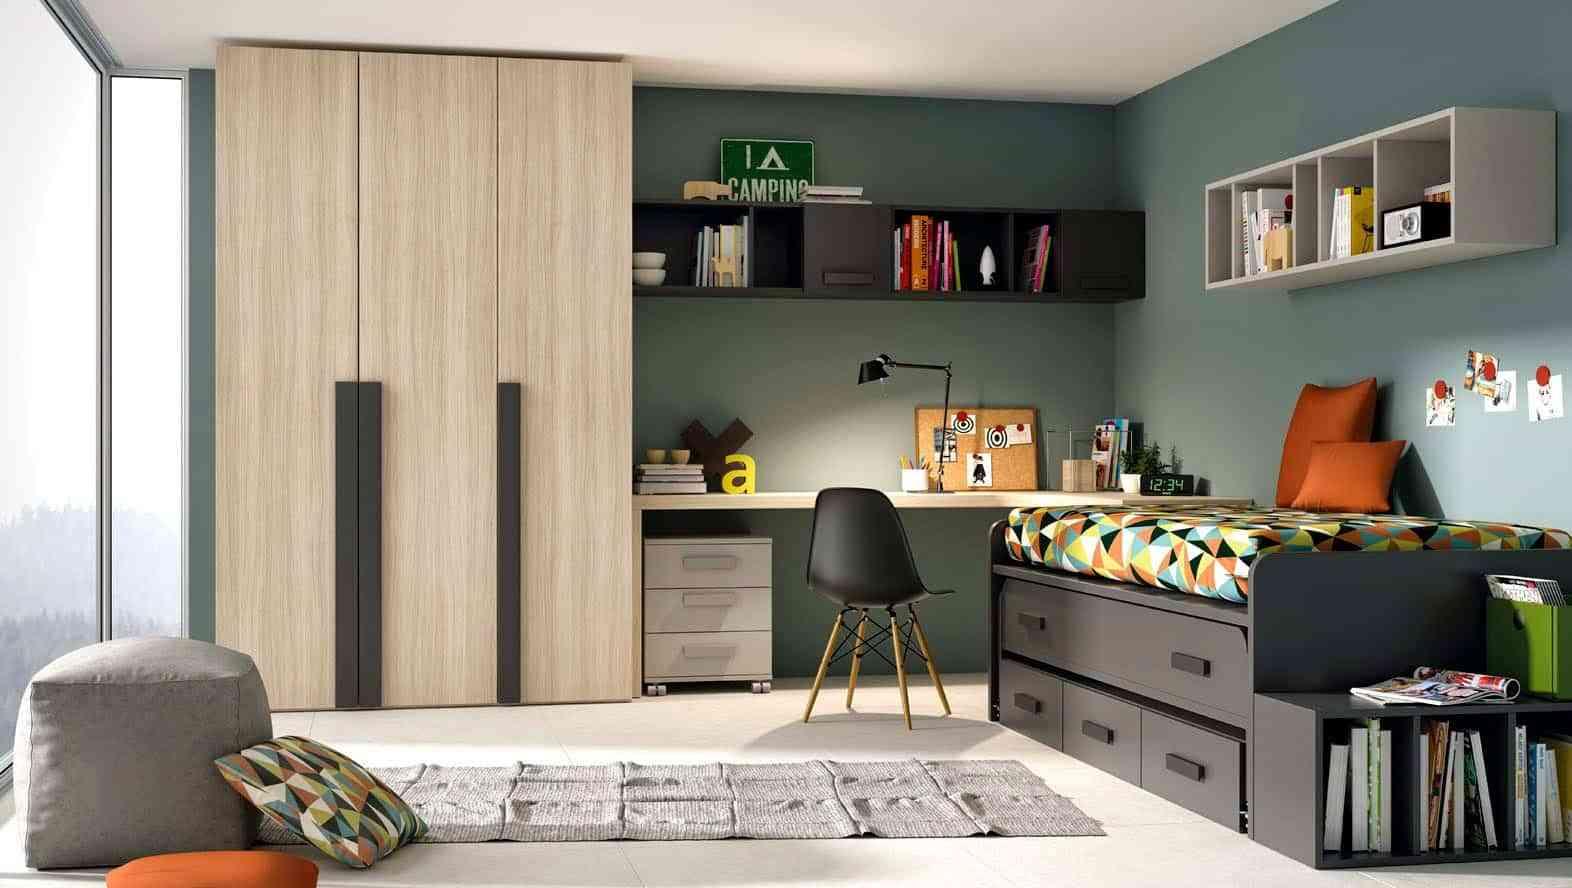 Dormitorios juveniles de dise o moderno a los que no podr for Diseno de muebles dormitorios juveniles